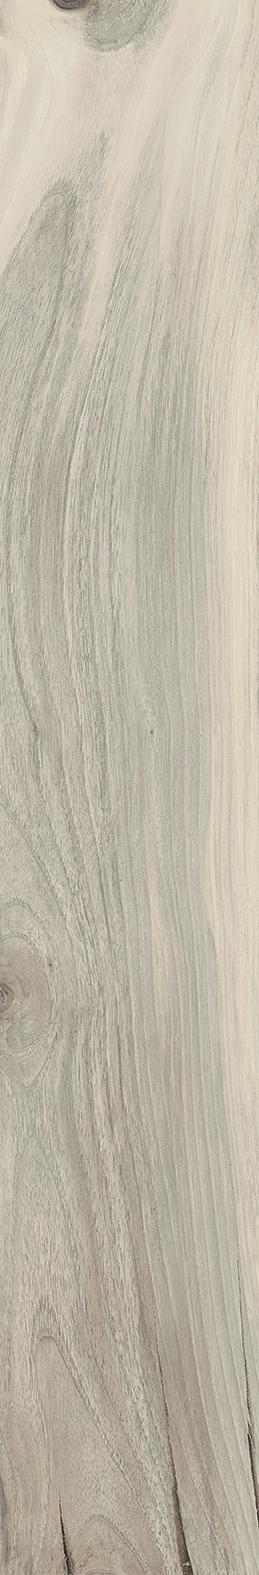 La Fabbrica  Kauri Catlins KAU075075  Boden-/Wandfliese 120x20 Natural